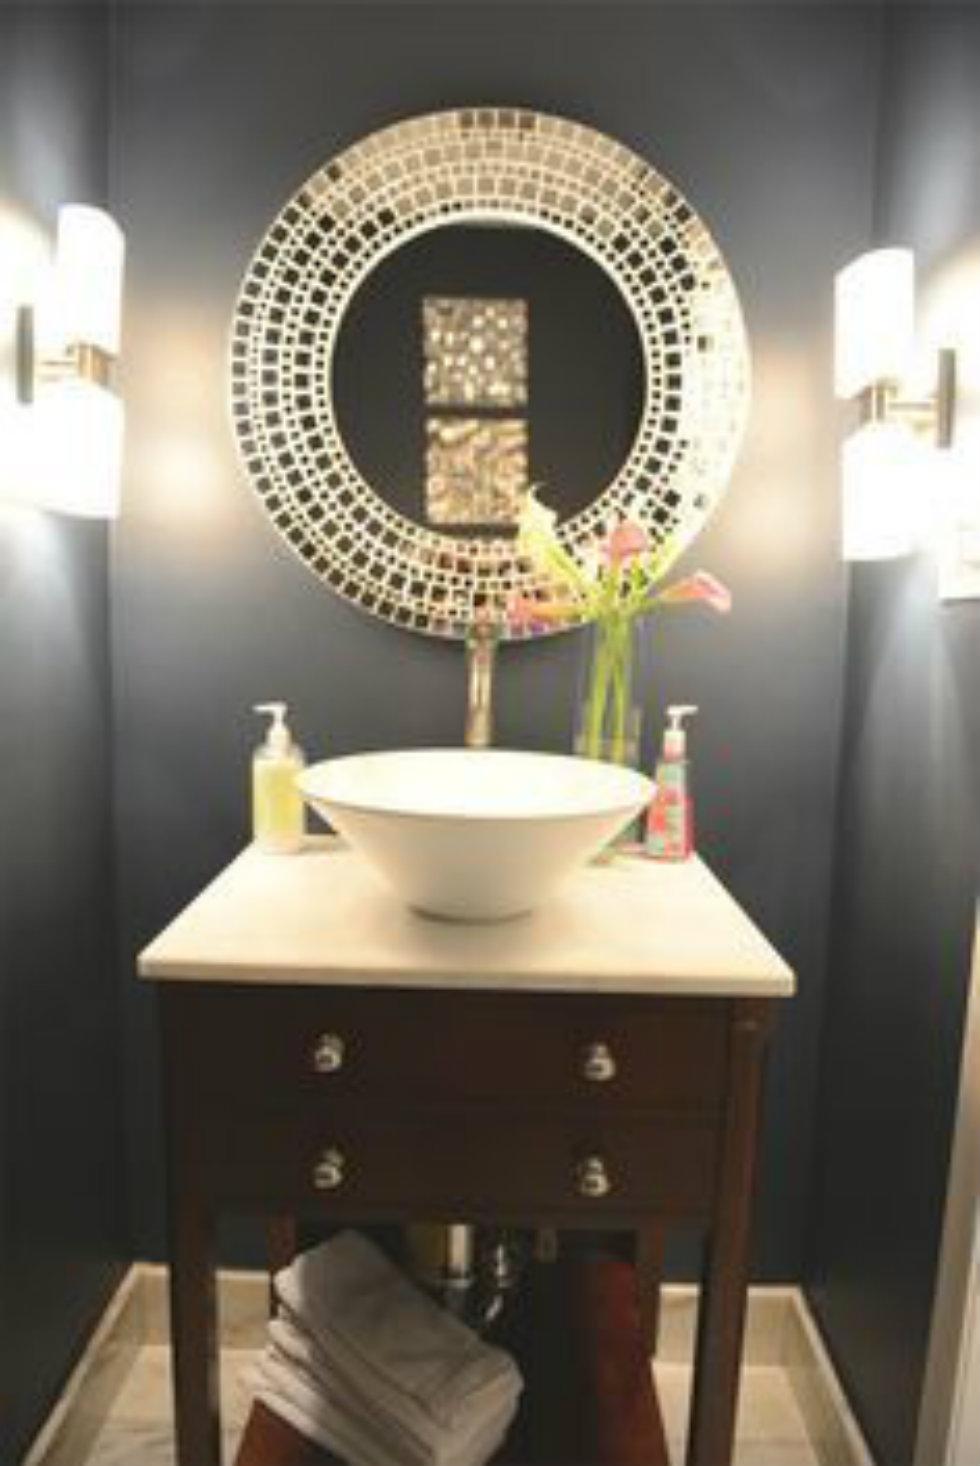 Original ideas for bathroom lighting lighting for Bathroom chandelier lighting ideas